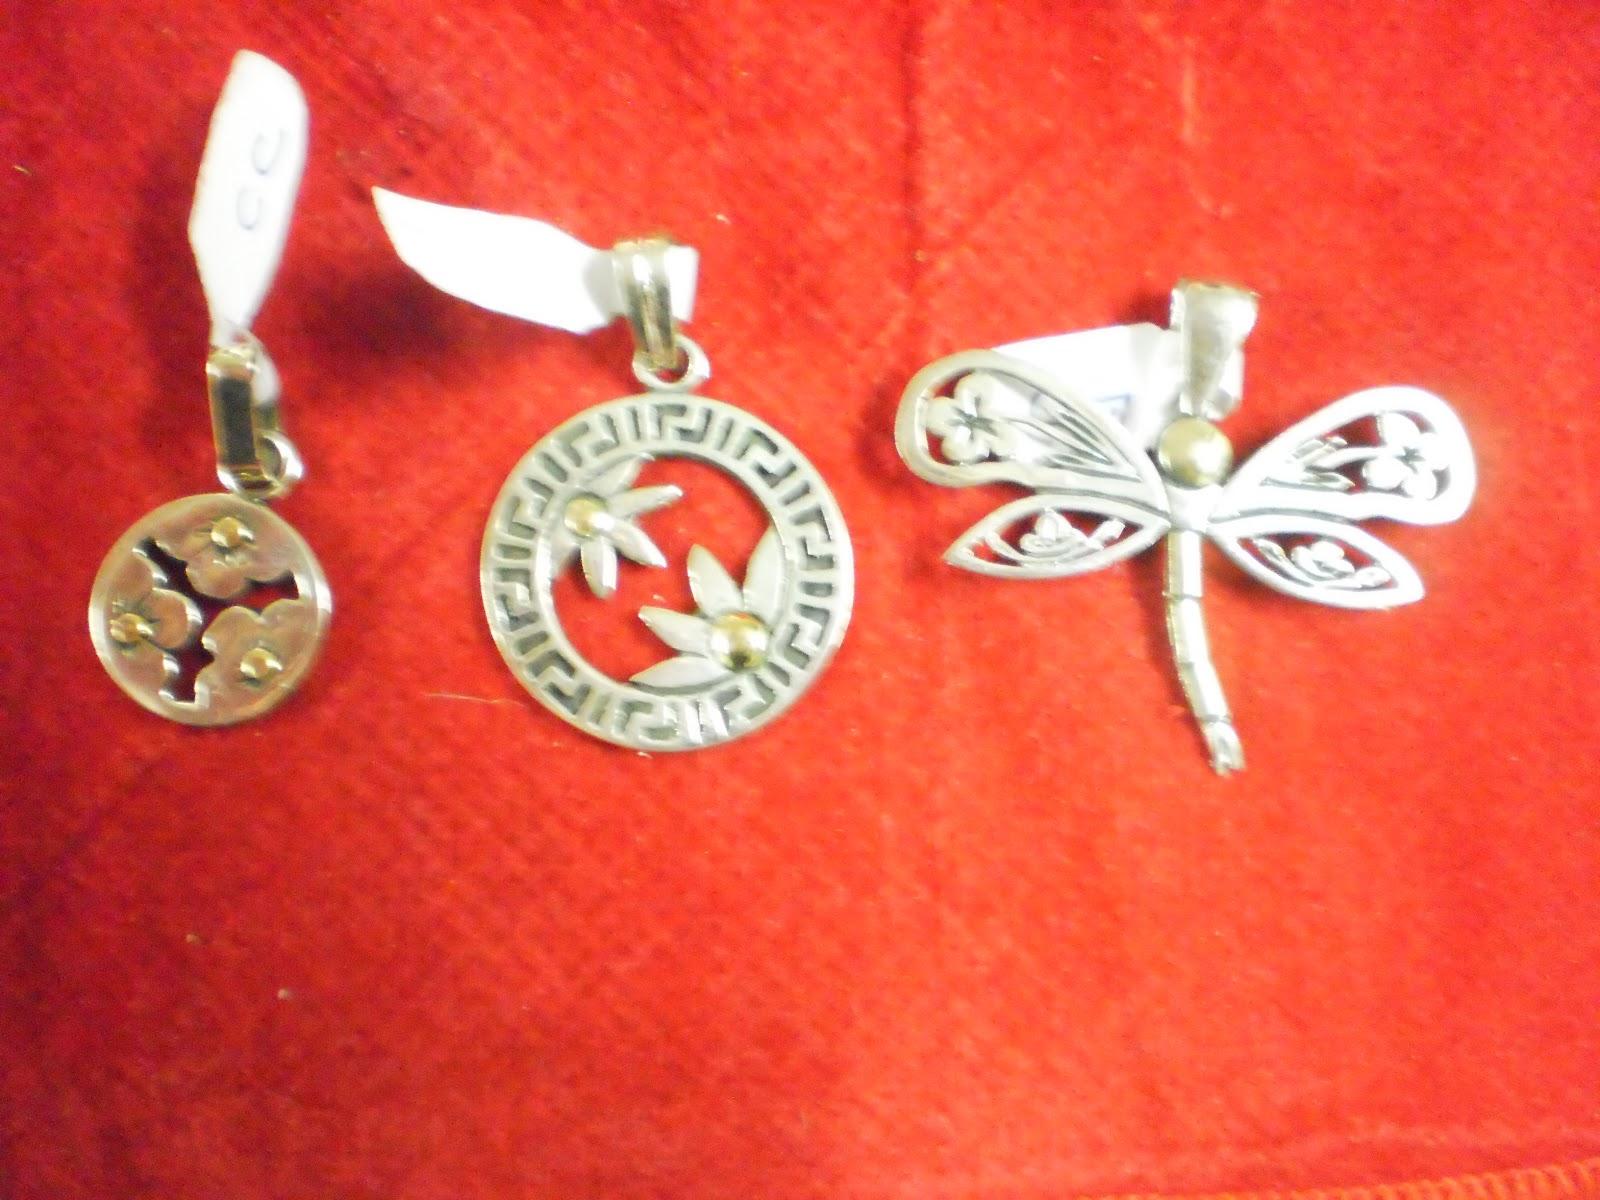 57fc101787f5 Aghata joyas  Dijes plata y oro diferentes motivos